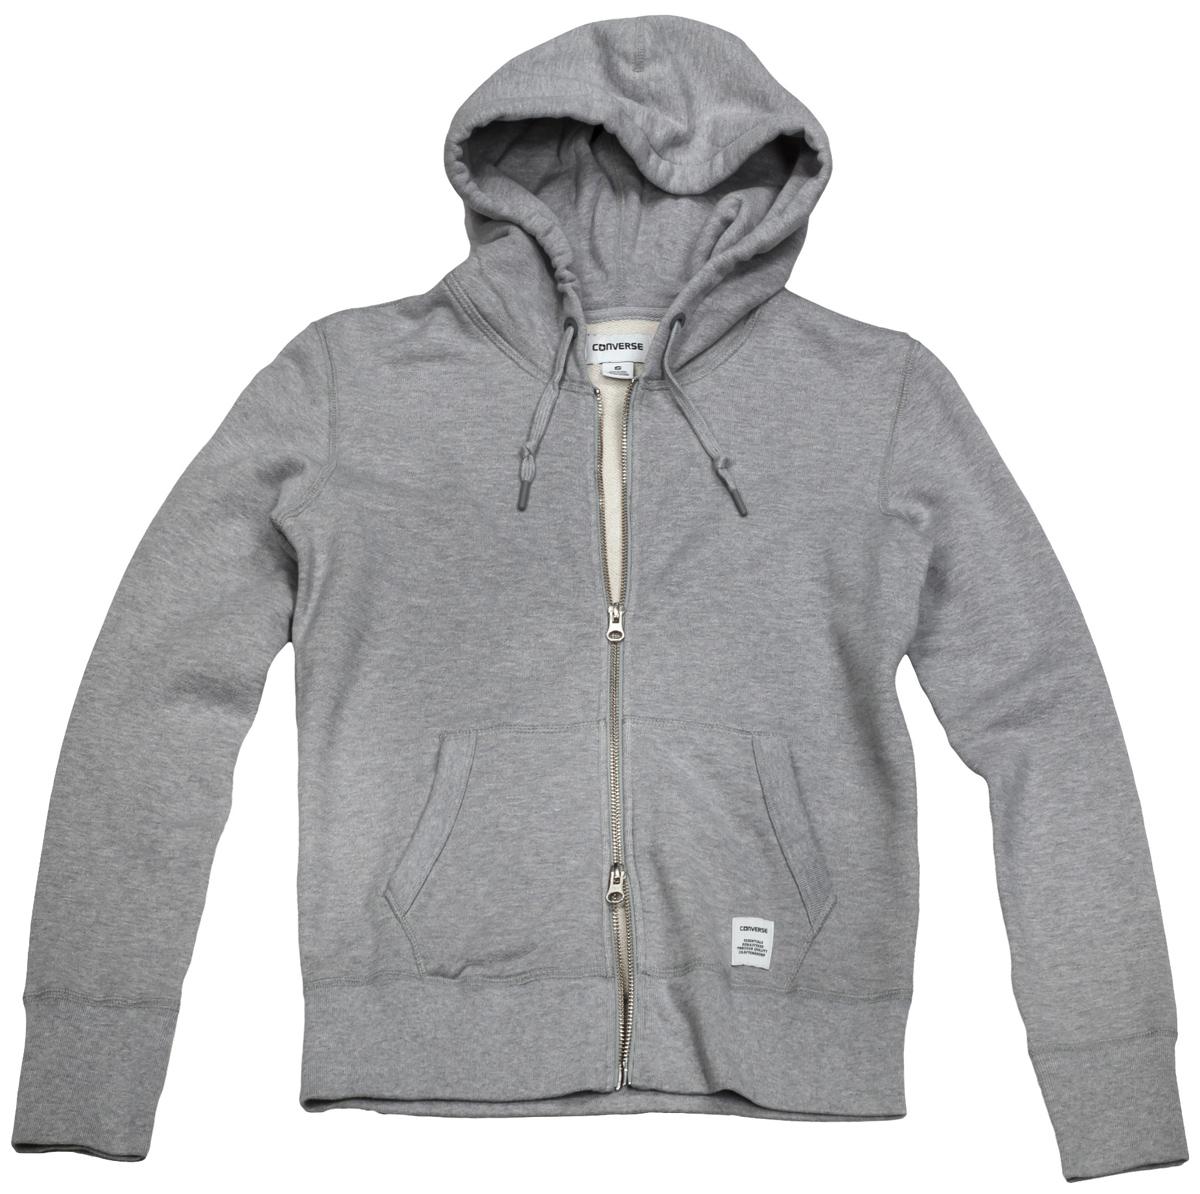 Толстовка жен Converse Sportswear Fz Hoodie. 1000101902210001019022